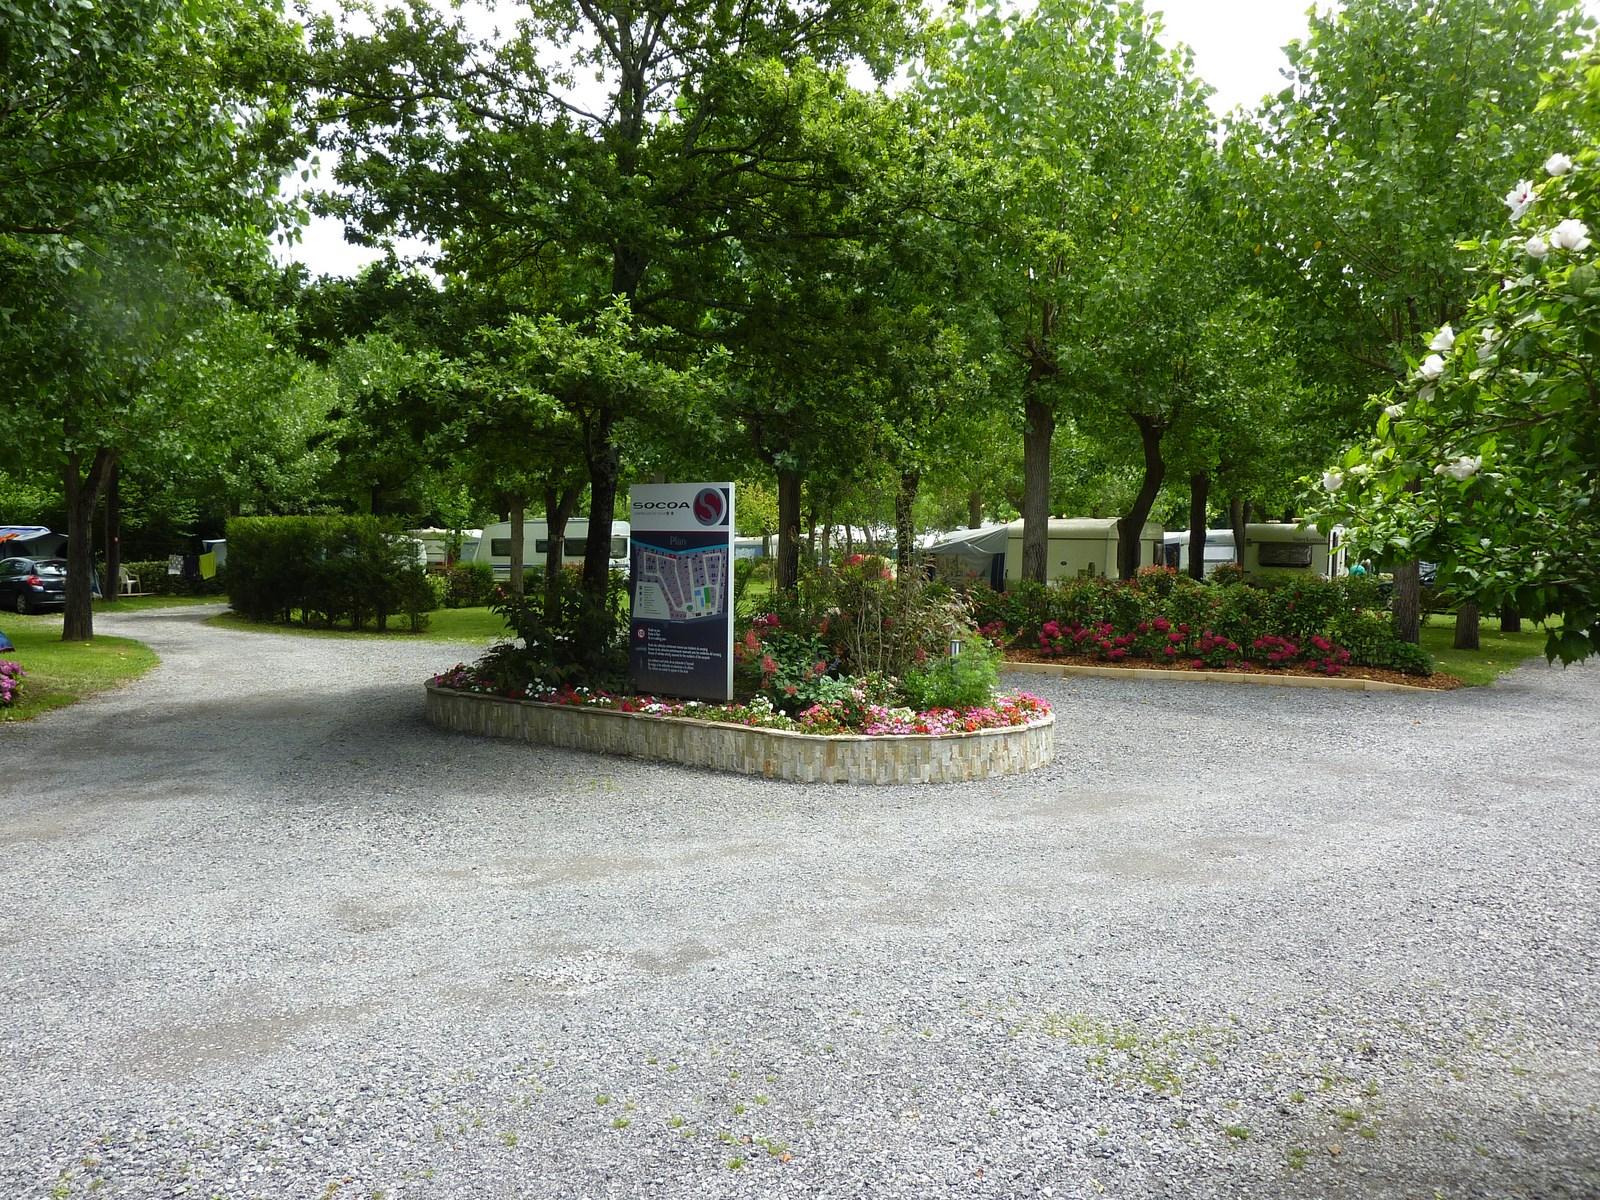 camping-untxin-socoa-terrain-parking